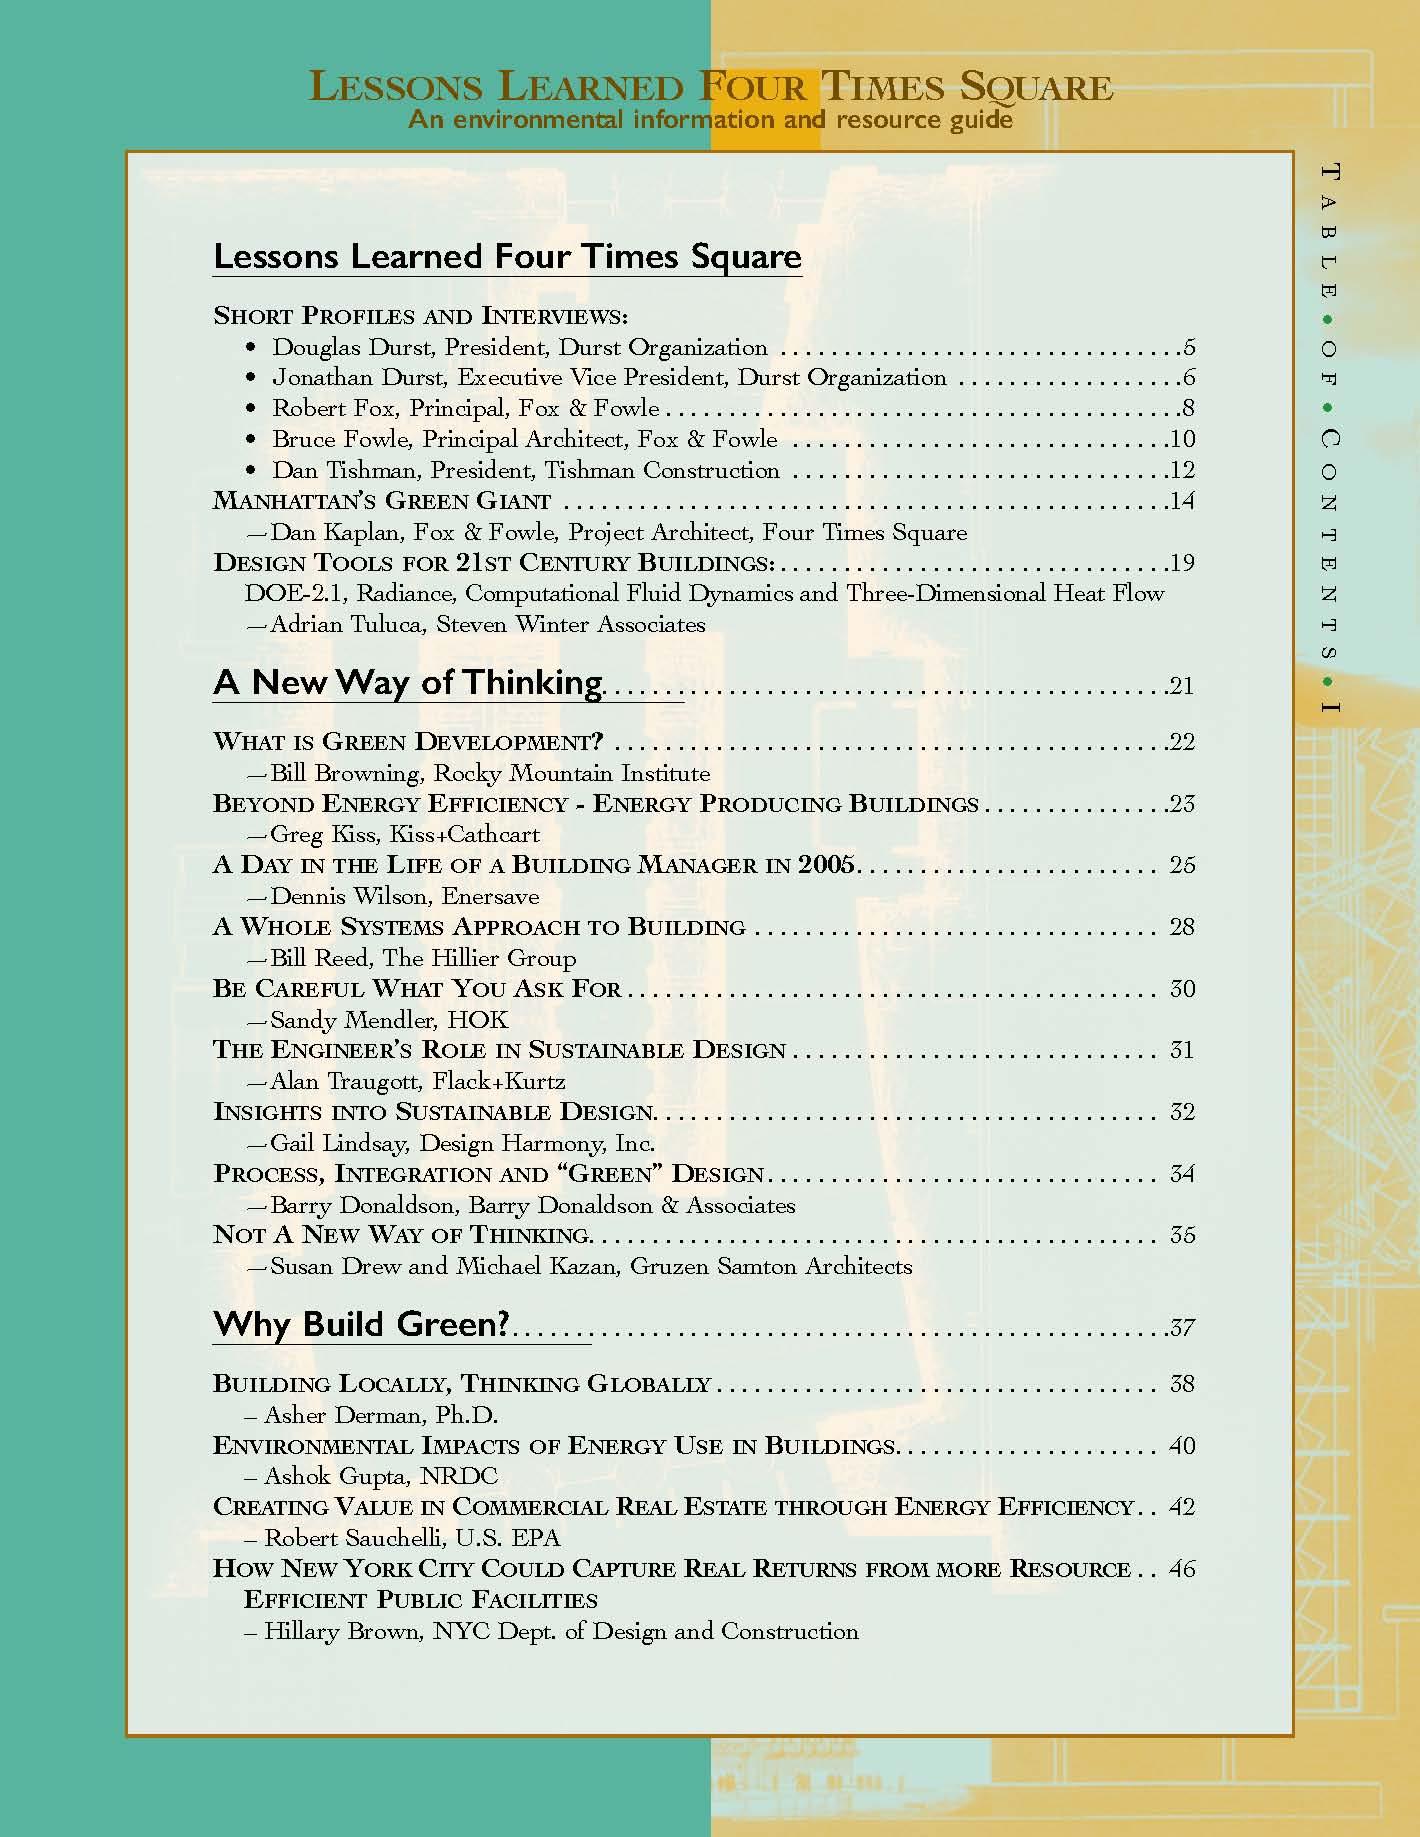 EDLL_Book 1 3.jpg